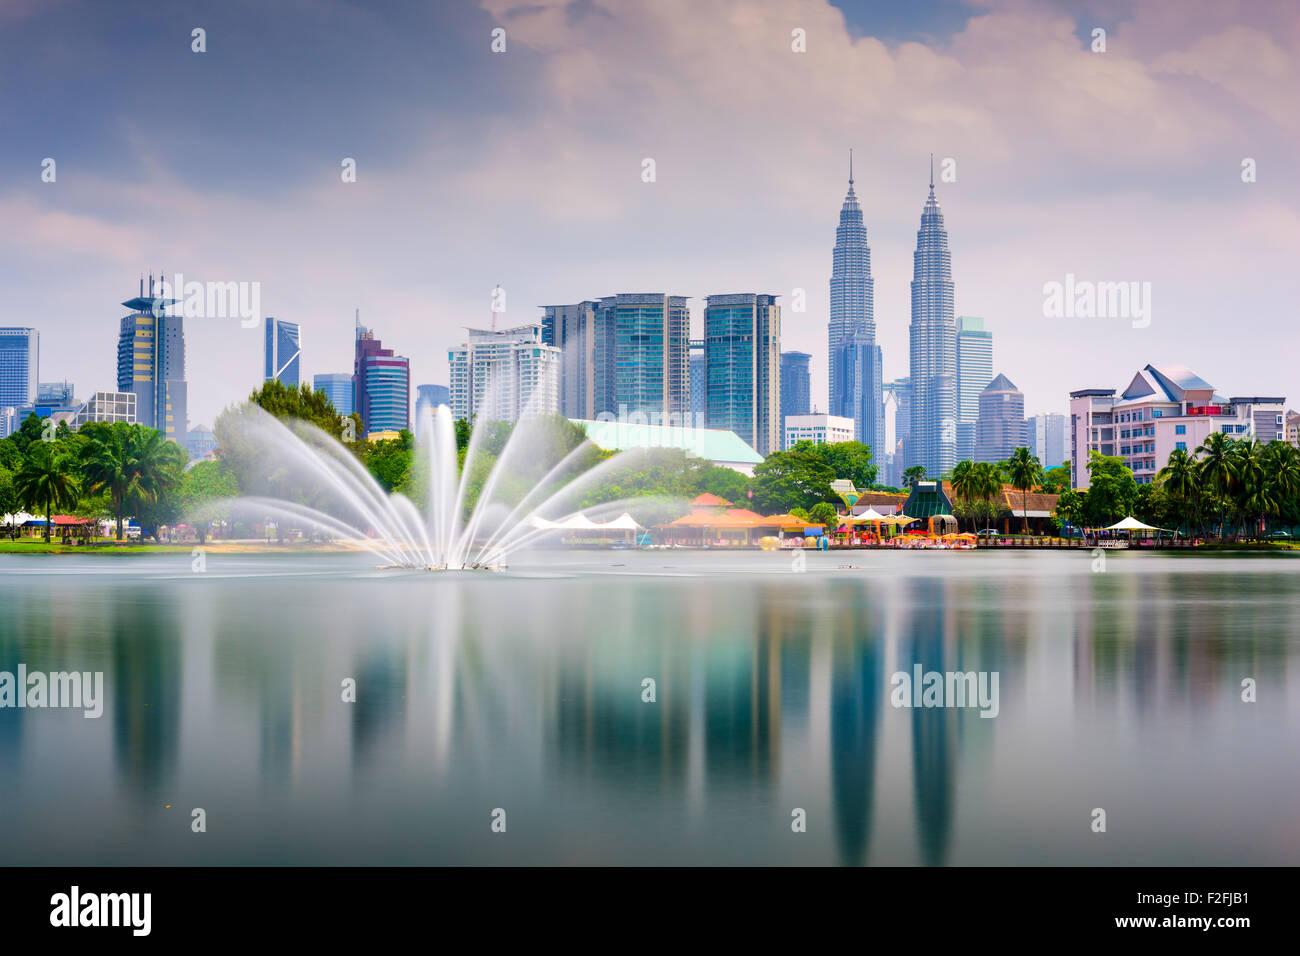 Kuala Lumpur, Malesia skyline a Titiwangsa Park. Immagini Stock